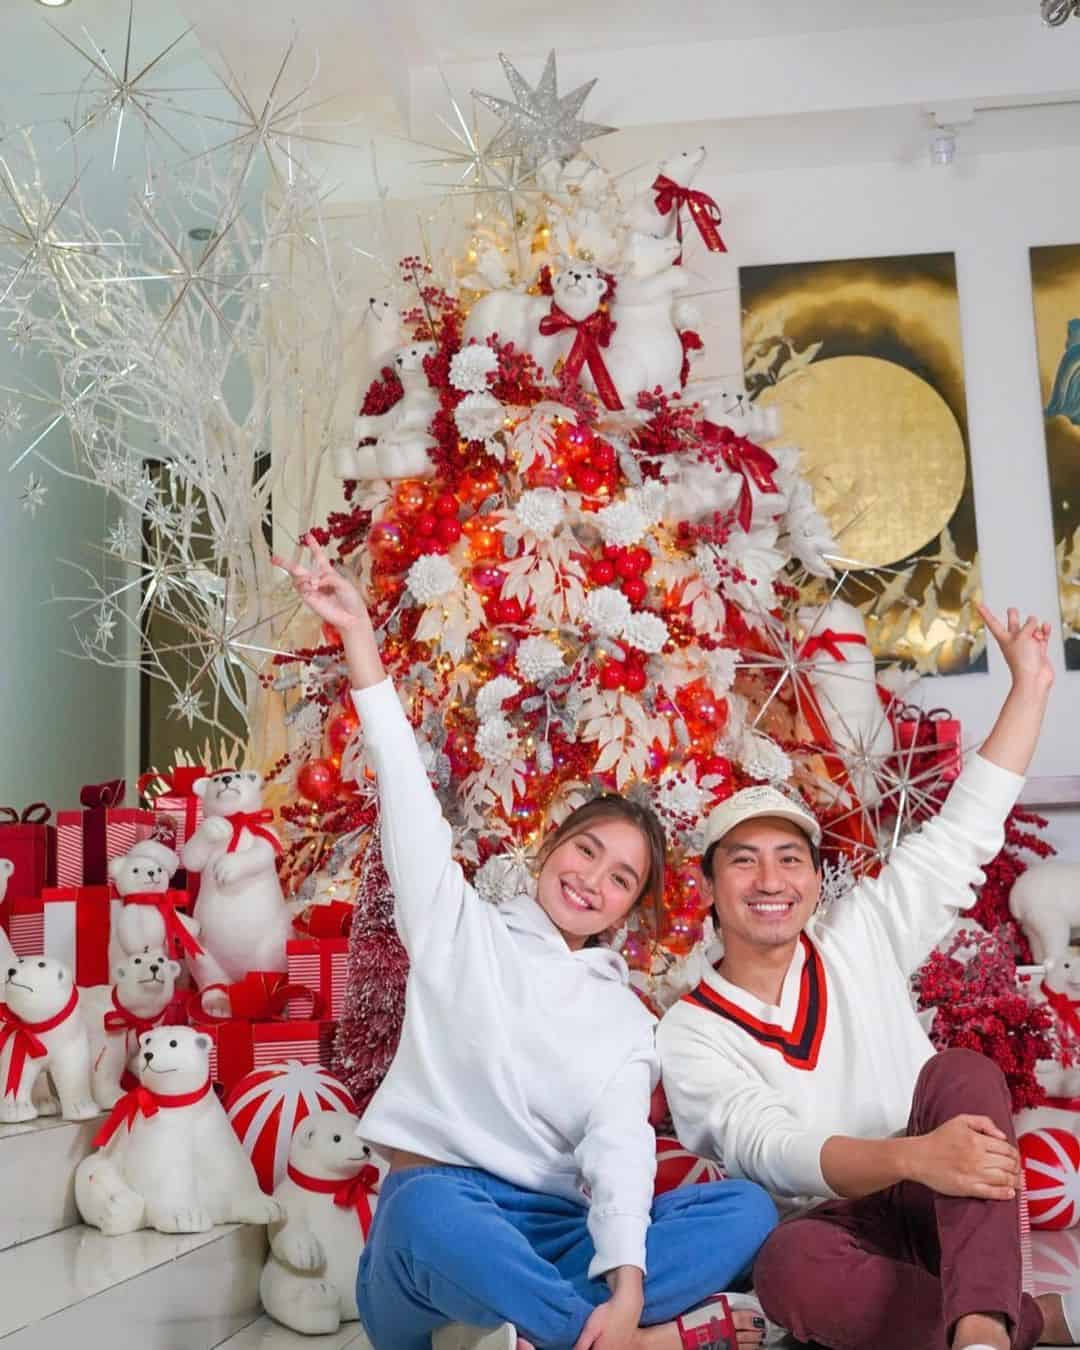 Kathryn Bernardo and Gideon Hermosa in front of the Bernardo 2020 Christmas tree